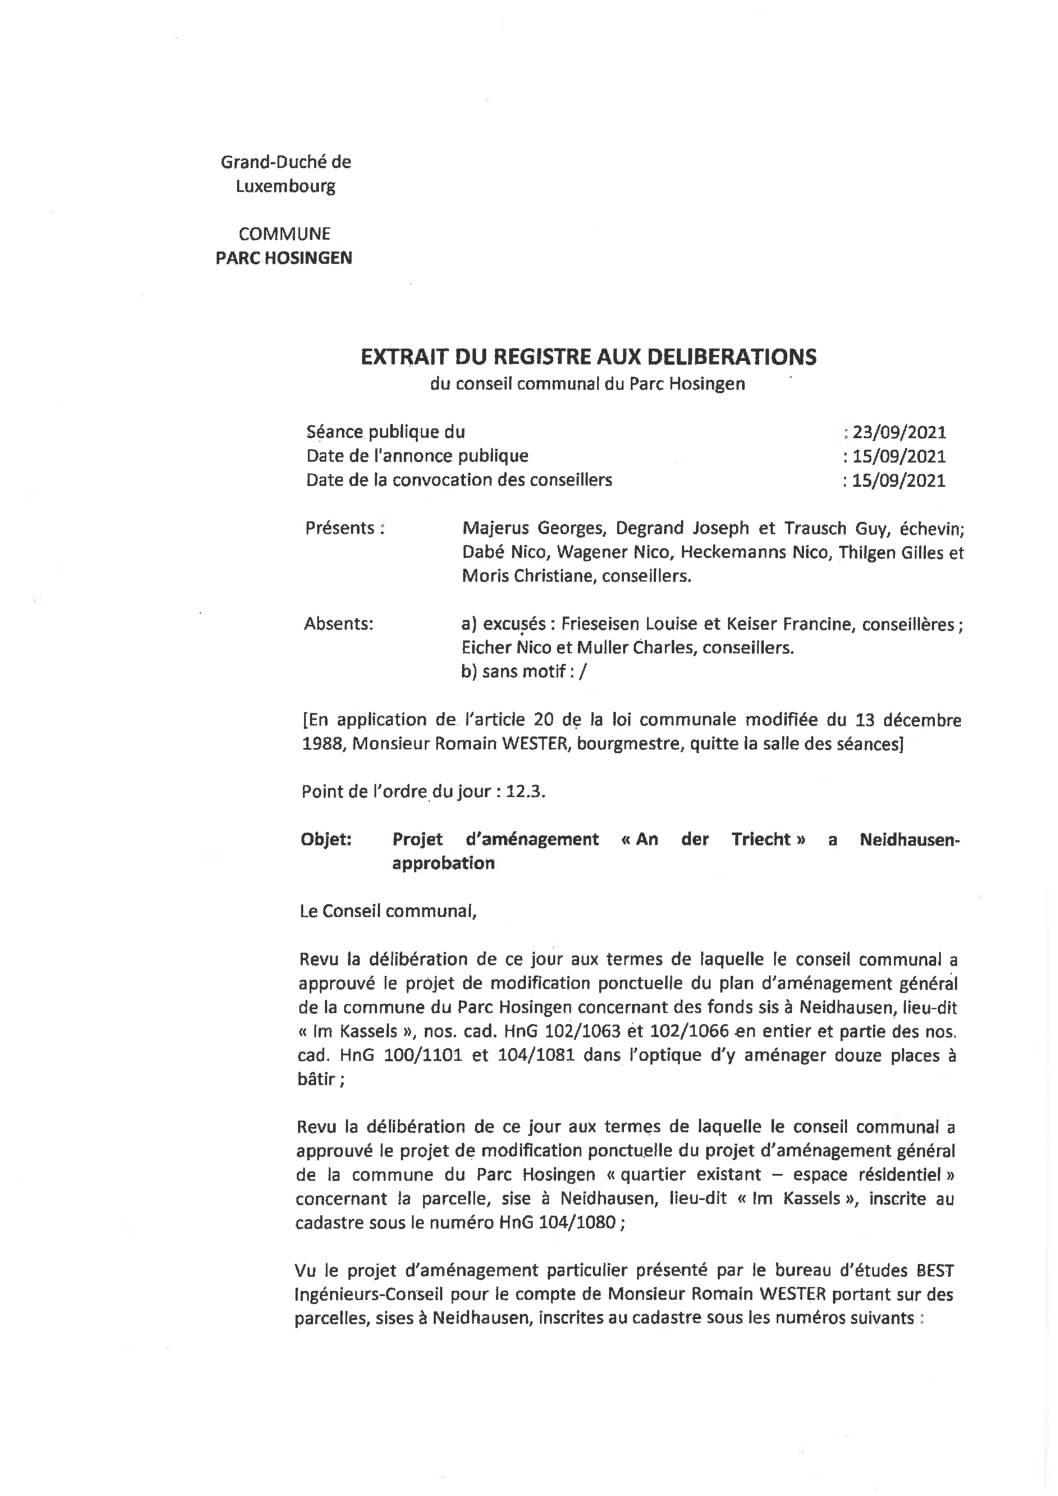 PAP An der Triecht Neidhausen - Avis au public & délibération du conseil communal